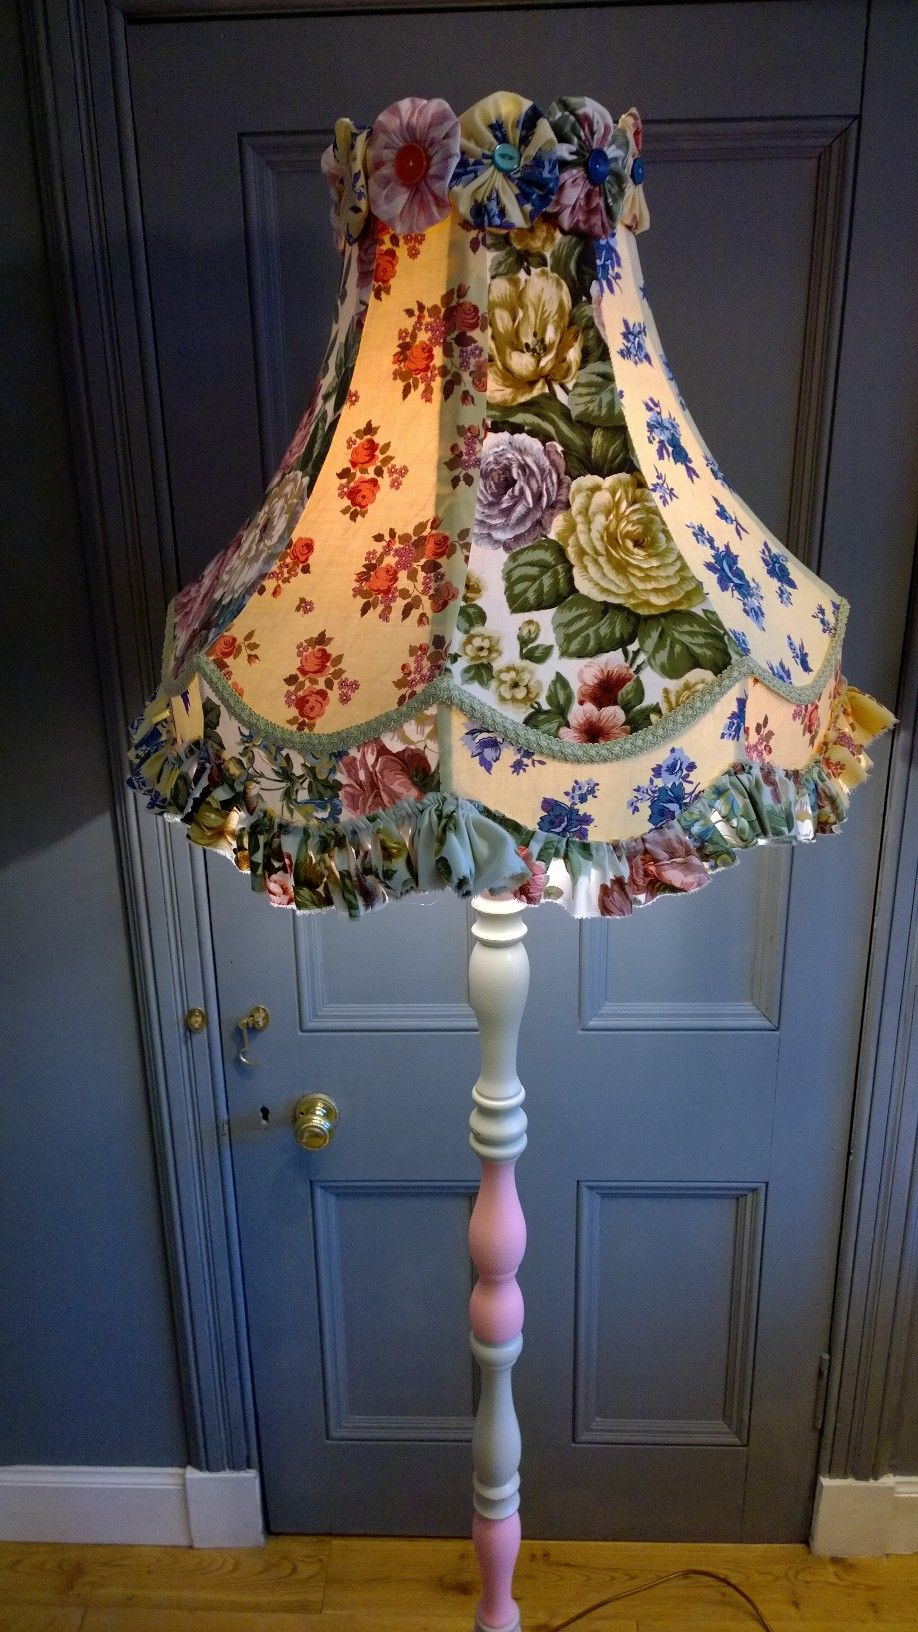 Clarabella Bespoke Table Lamp Using Vintage Chintz Www Clarabellachristie Co Uk Beaded Lampshade Homemade Home Decor Diy Lamp Shade